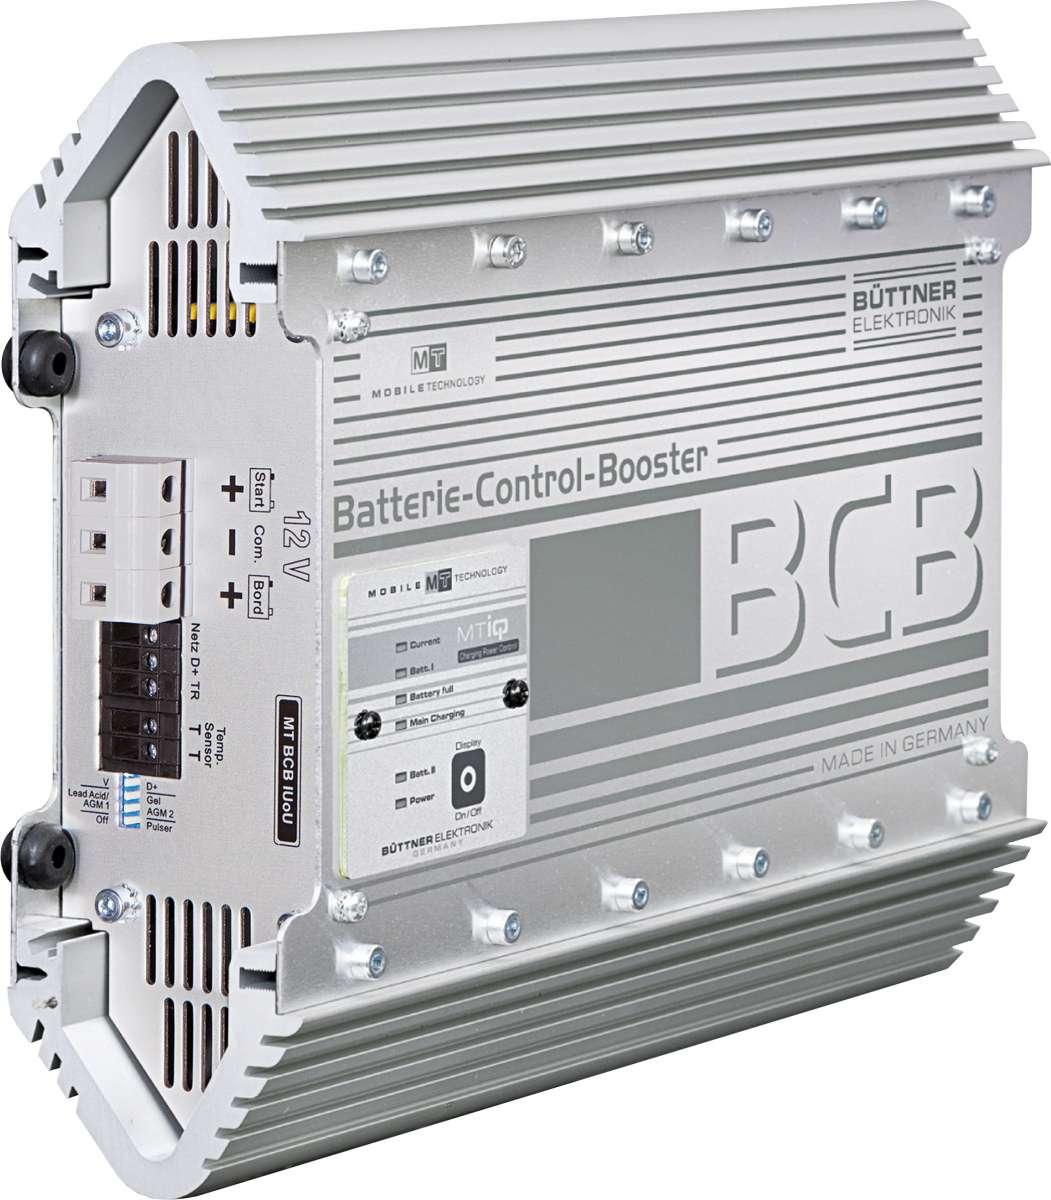 Batterie-Control-Booster MT BCB 20/20 IUoU   Elektro, Energieversorgung, Batterien & Ladegeräte